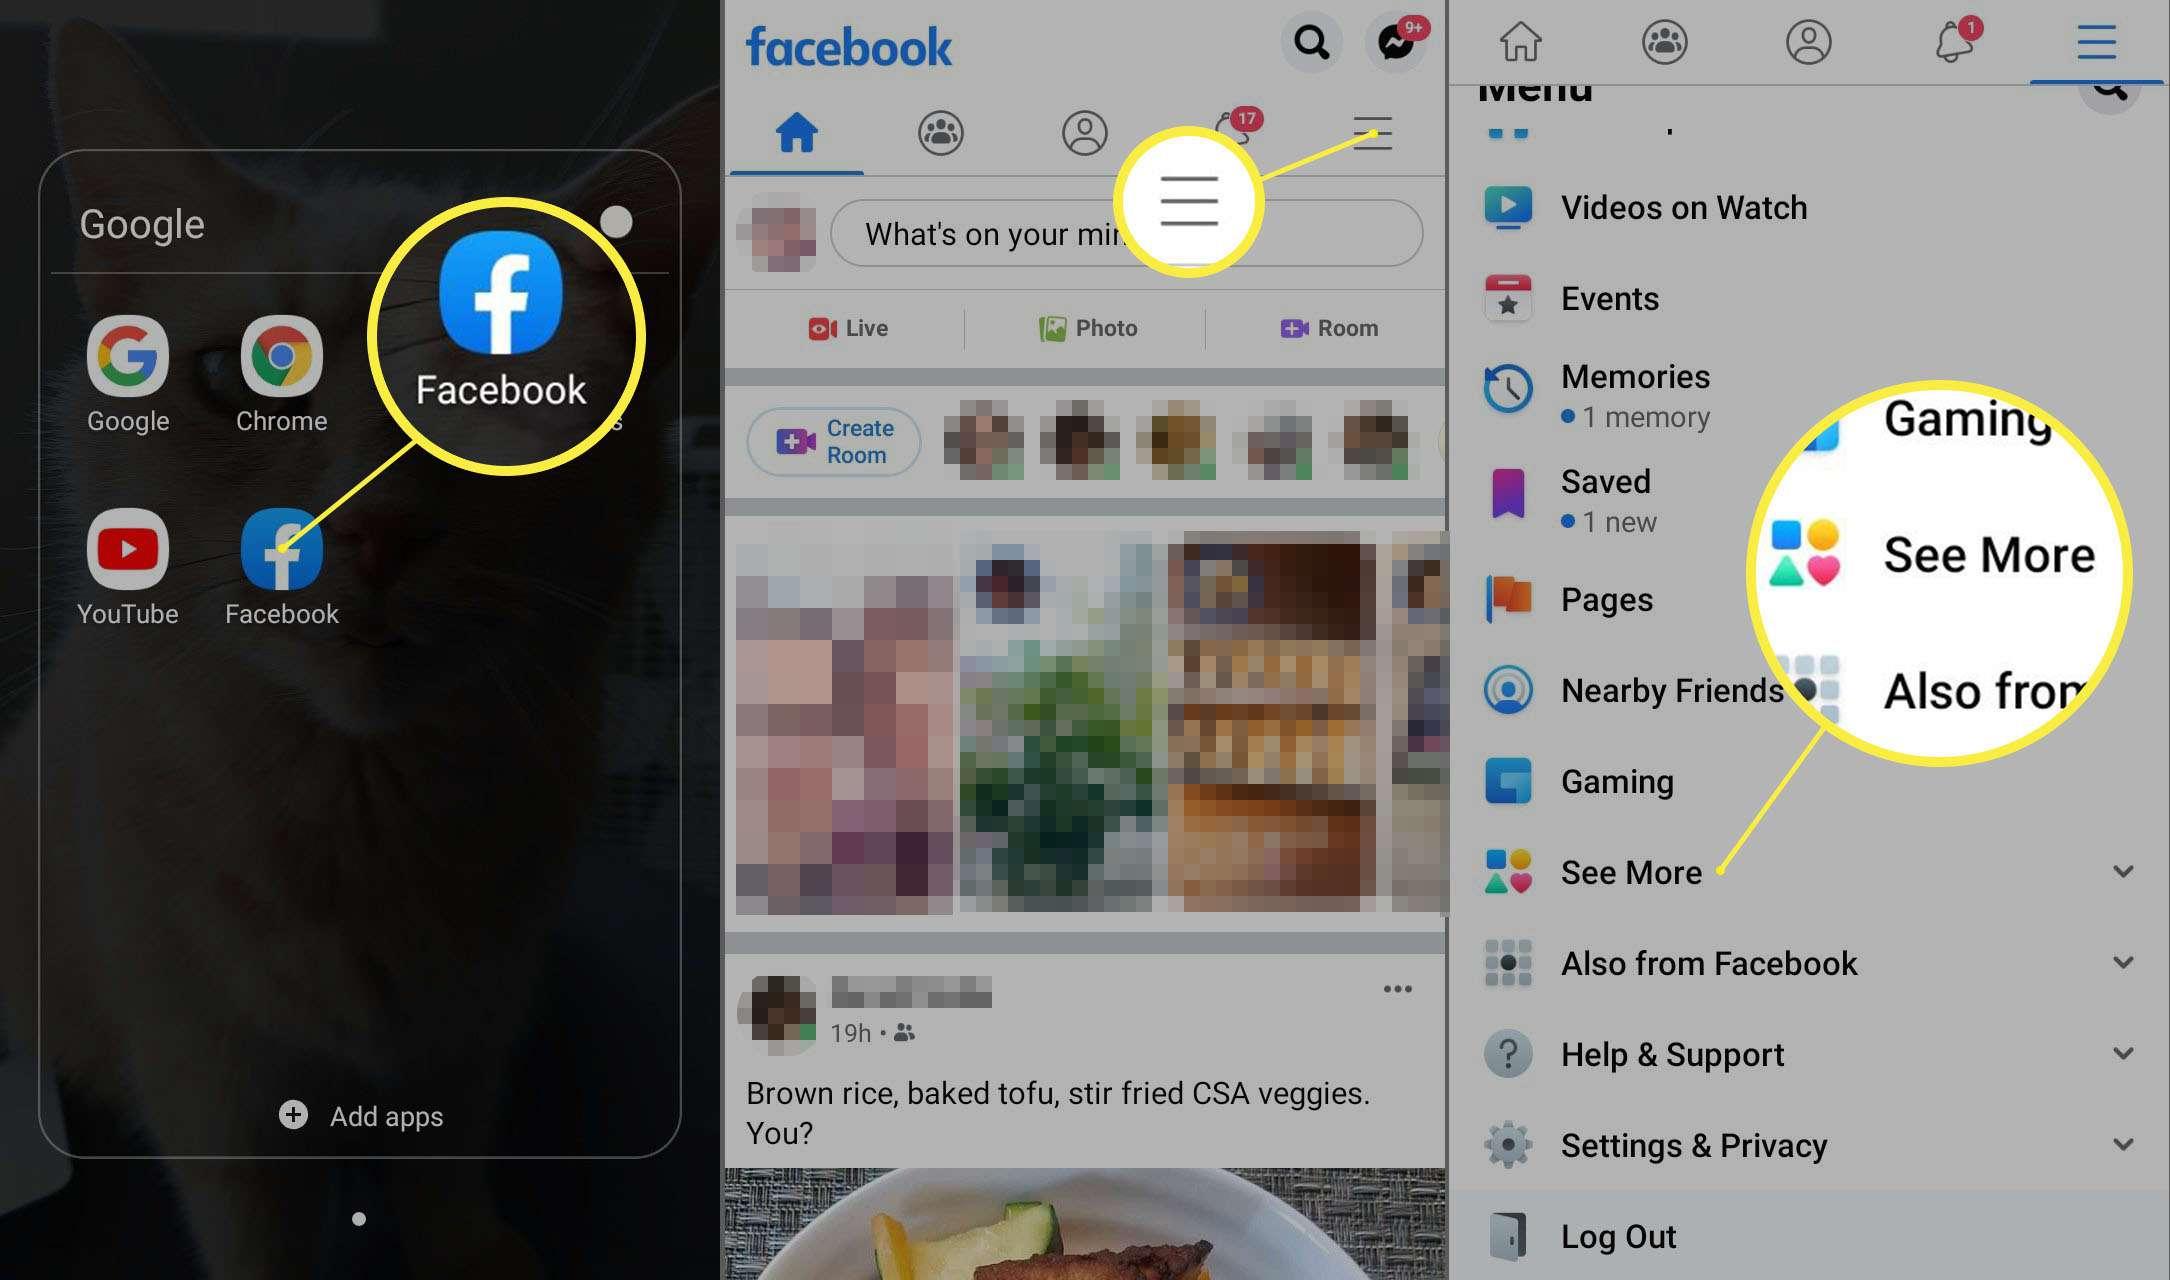 Facebook app for Android main menu.